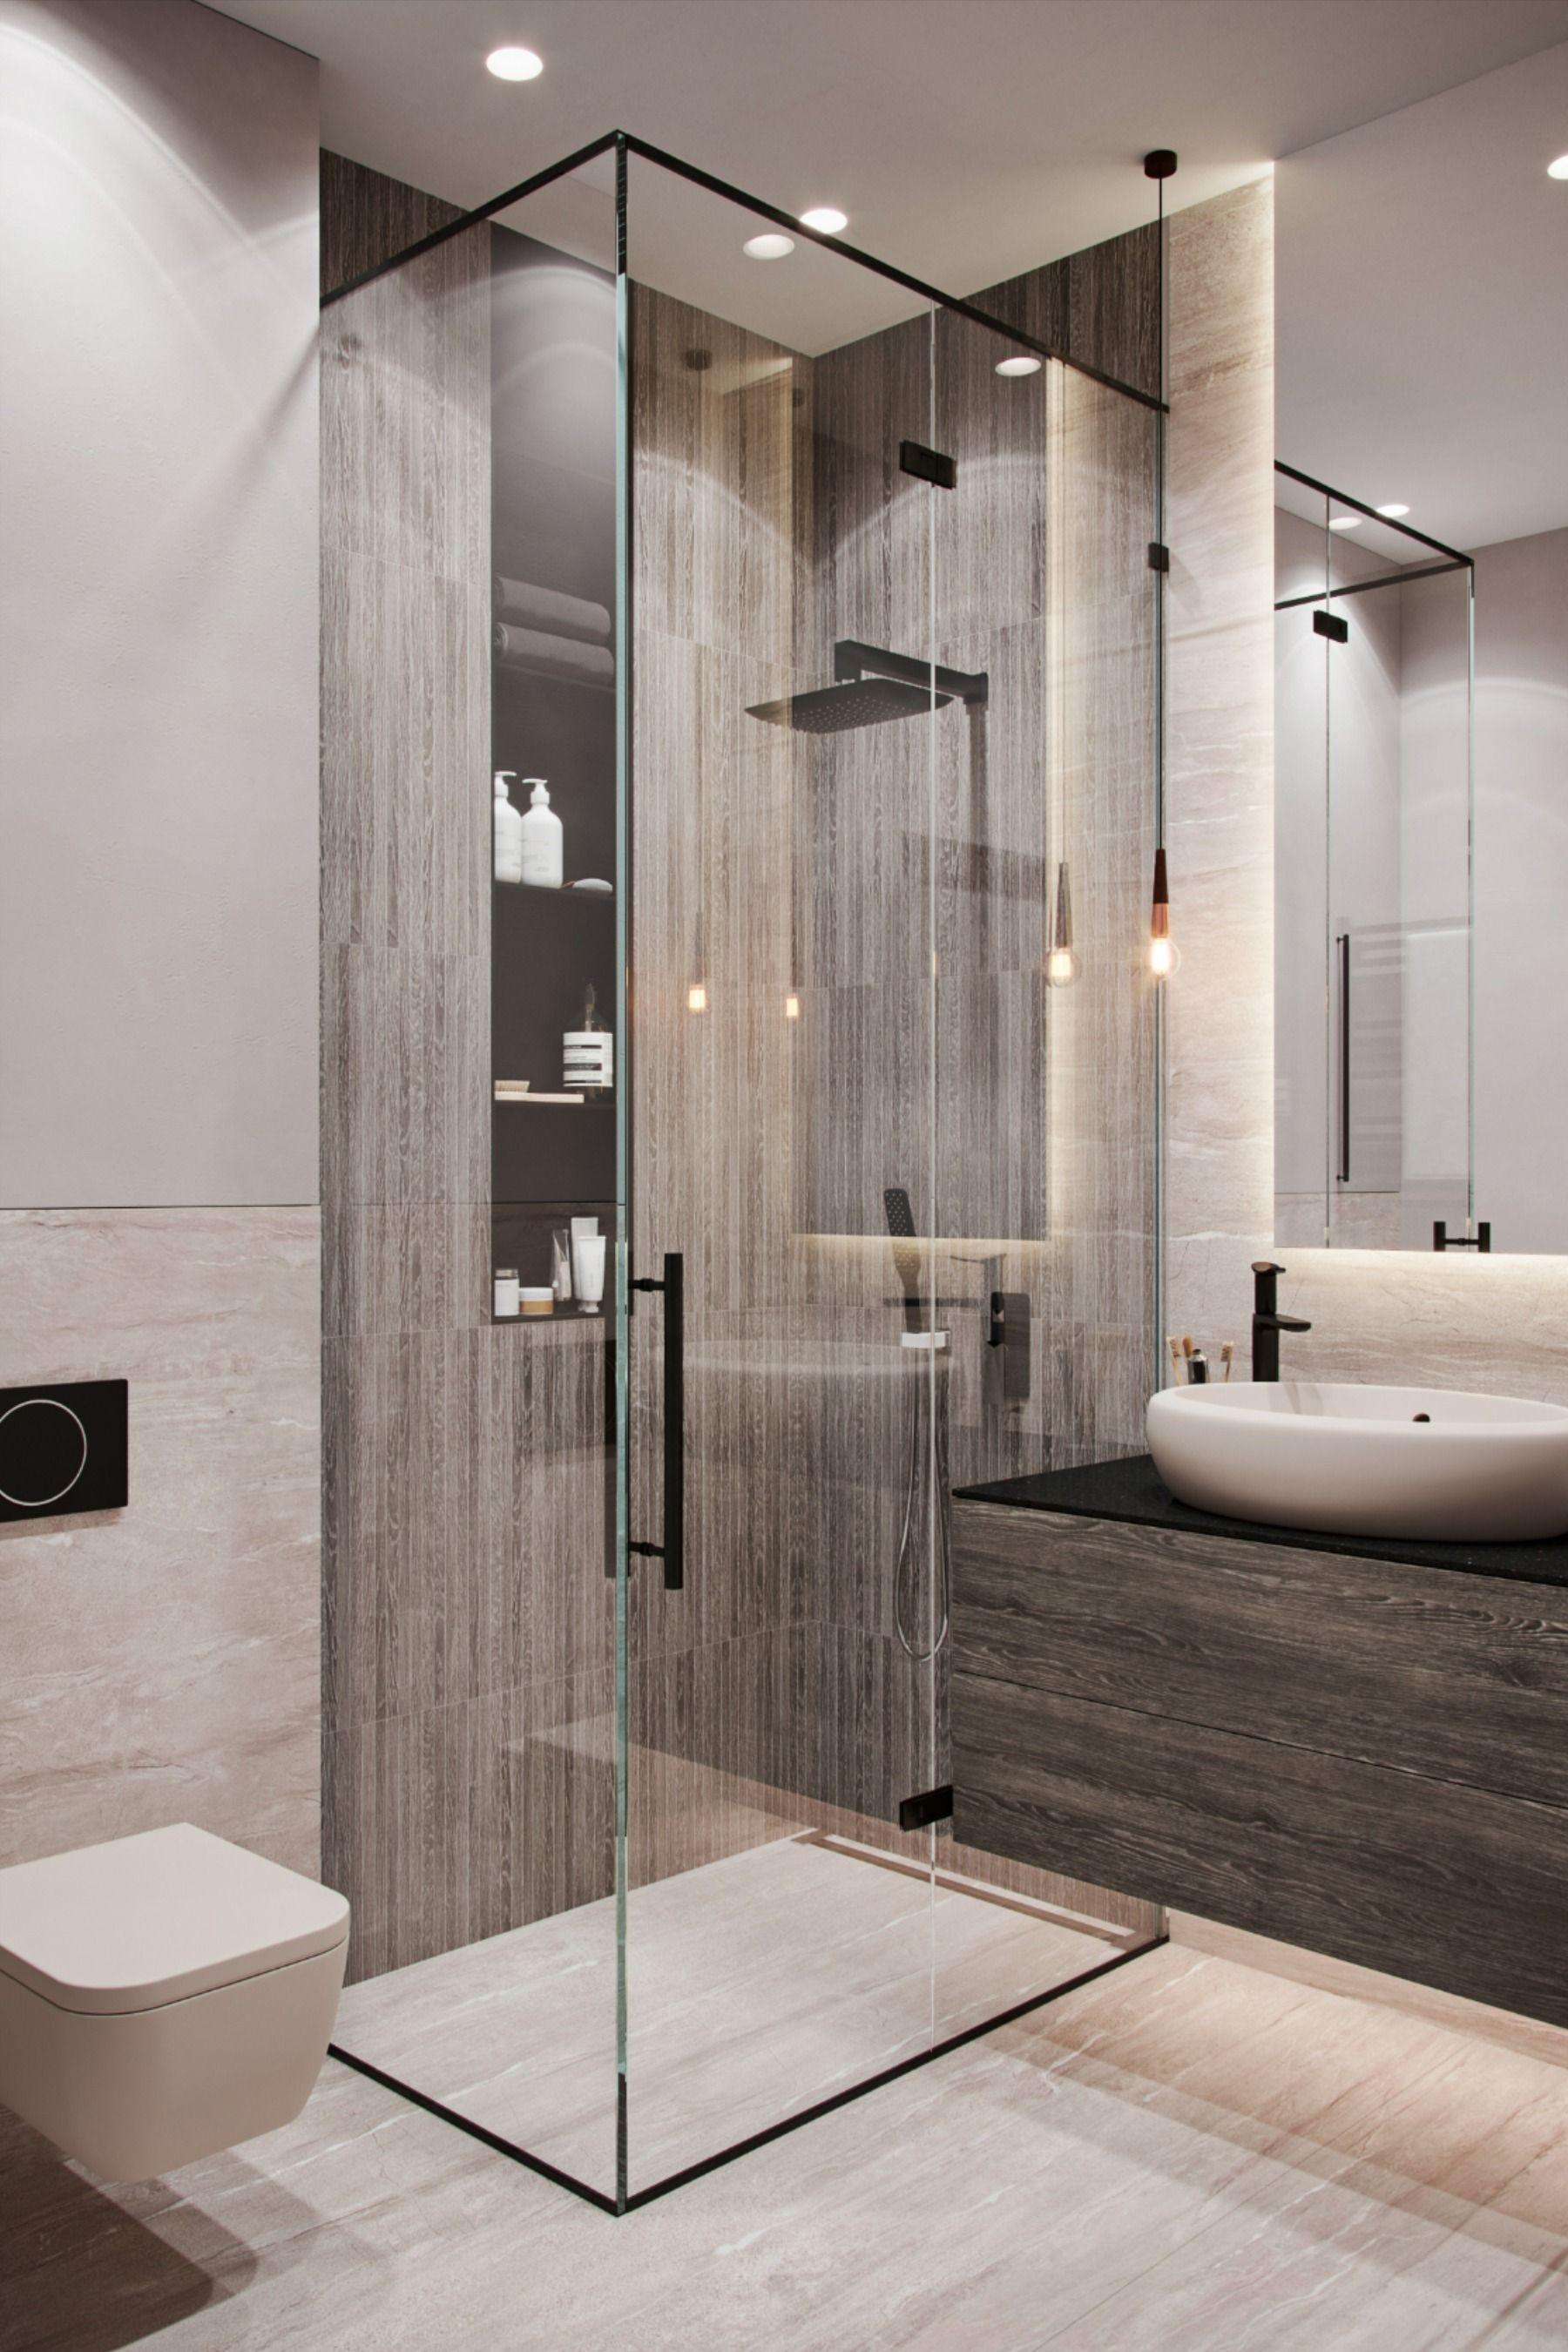 Stunning Shower Room With Glass Panel In 2020 Bathroom Design Small Bathroom Design Inspiration Bathroom Interior Design